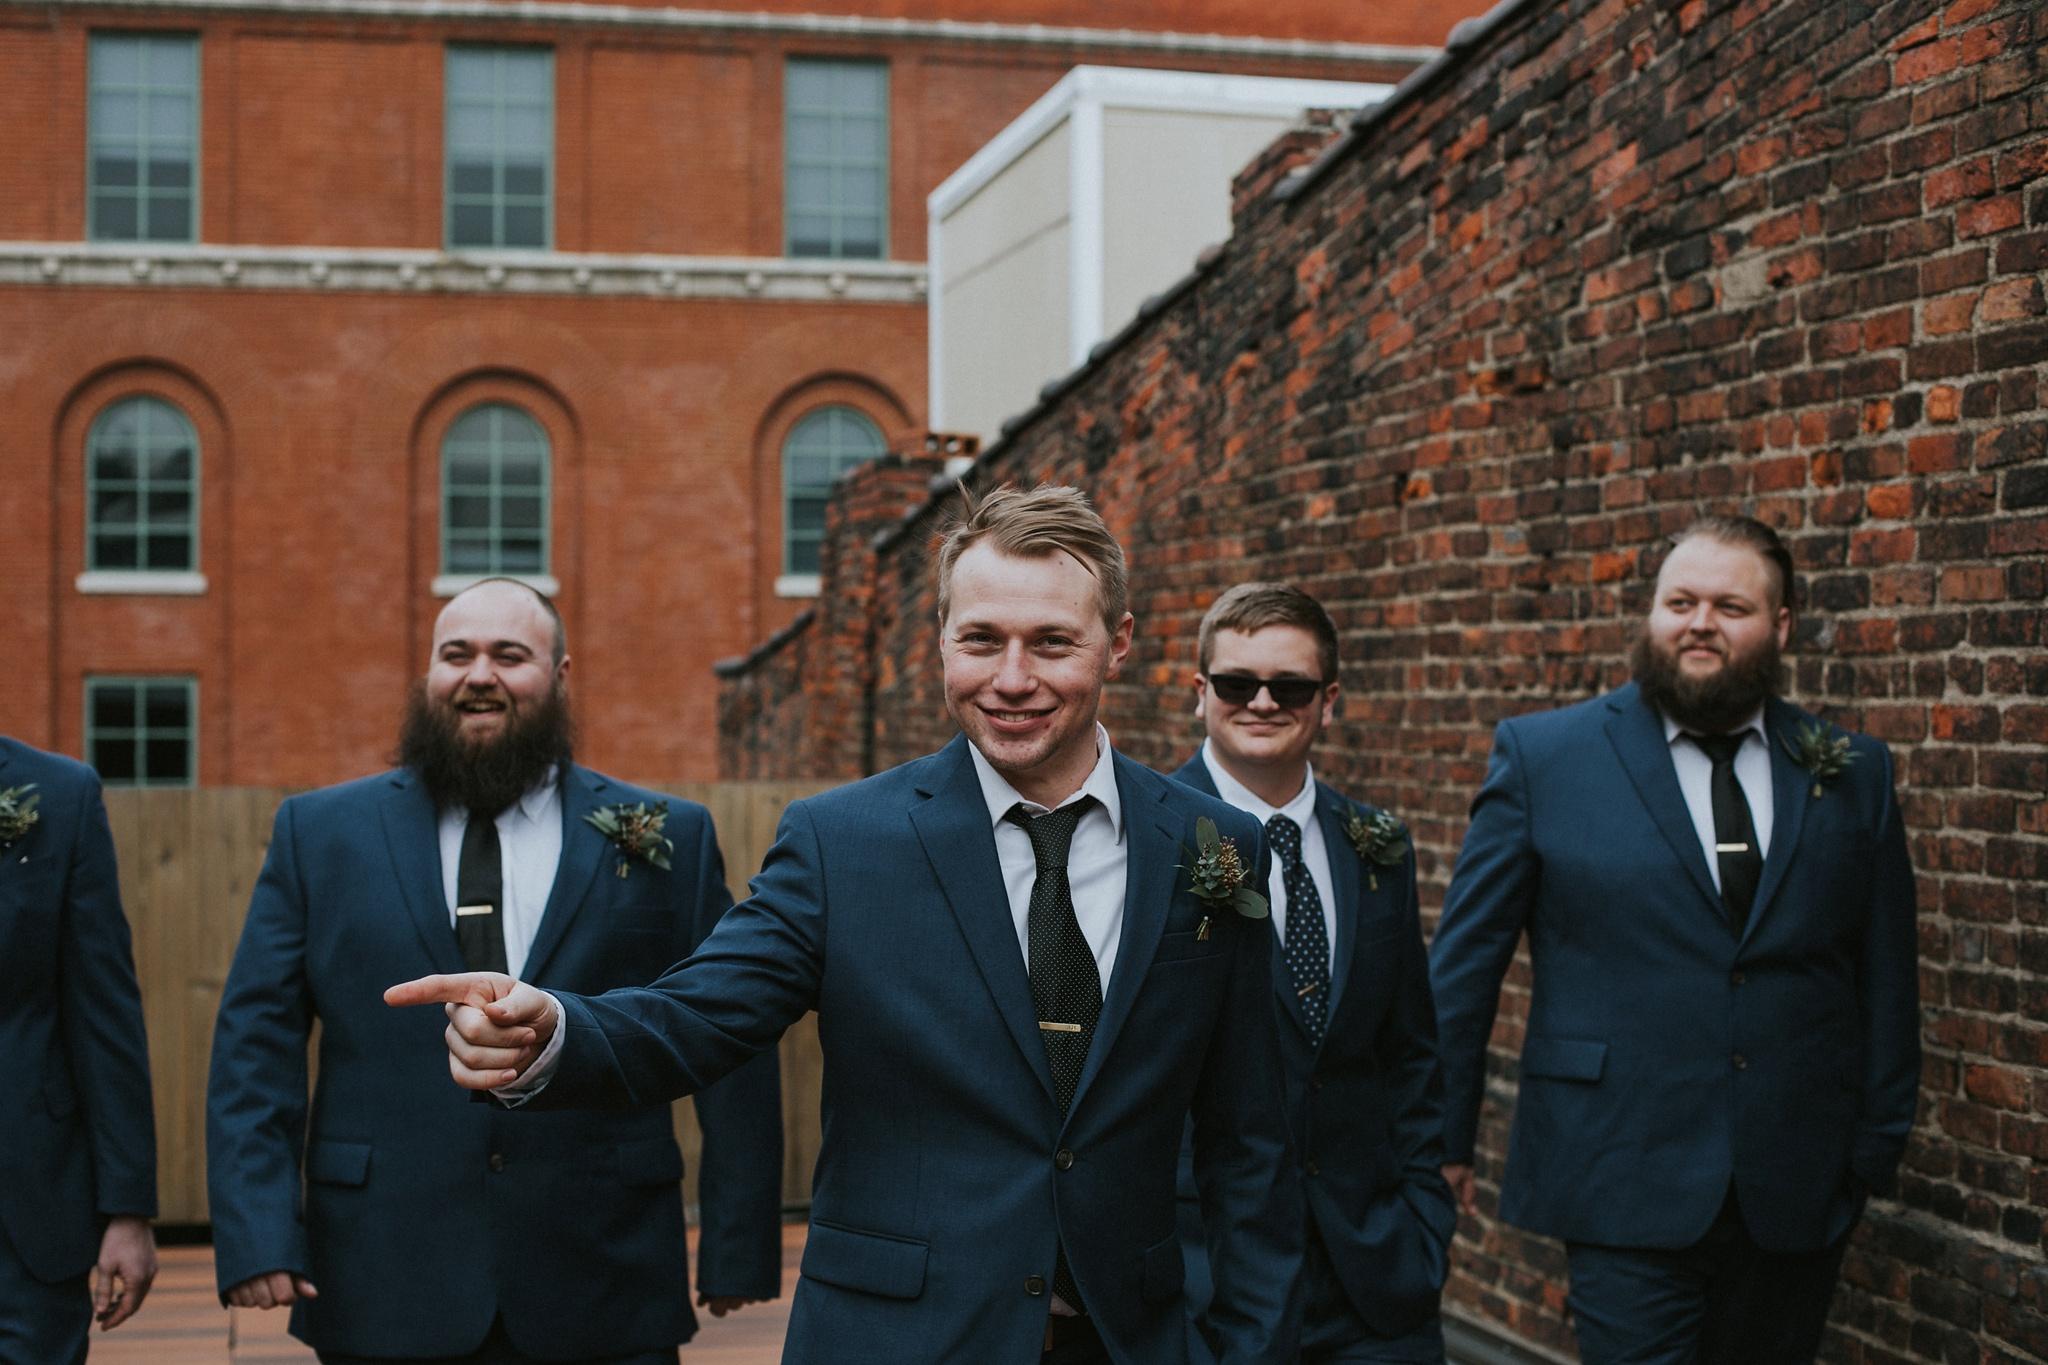 Downtown-Louisville-Surprise-Wedding_0026.jpg